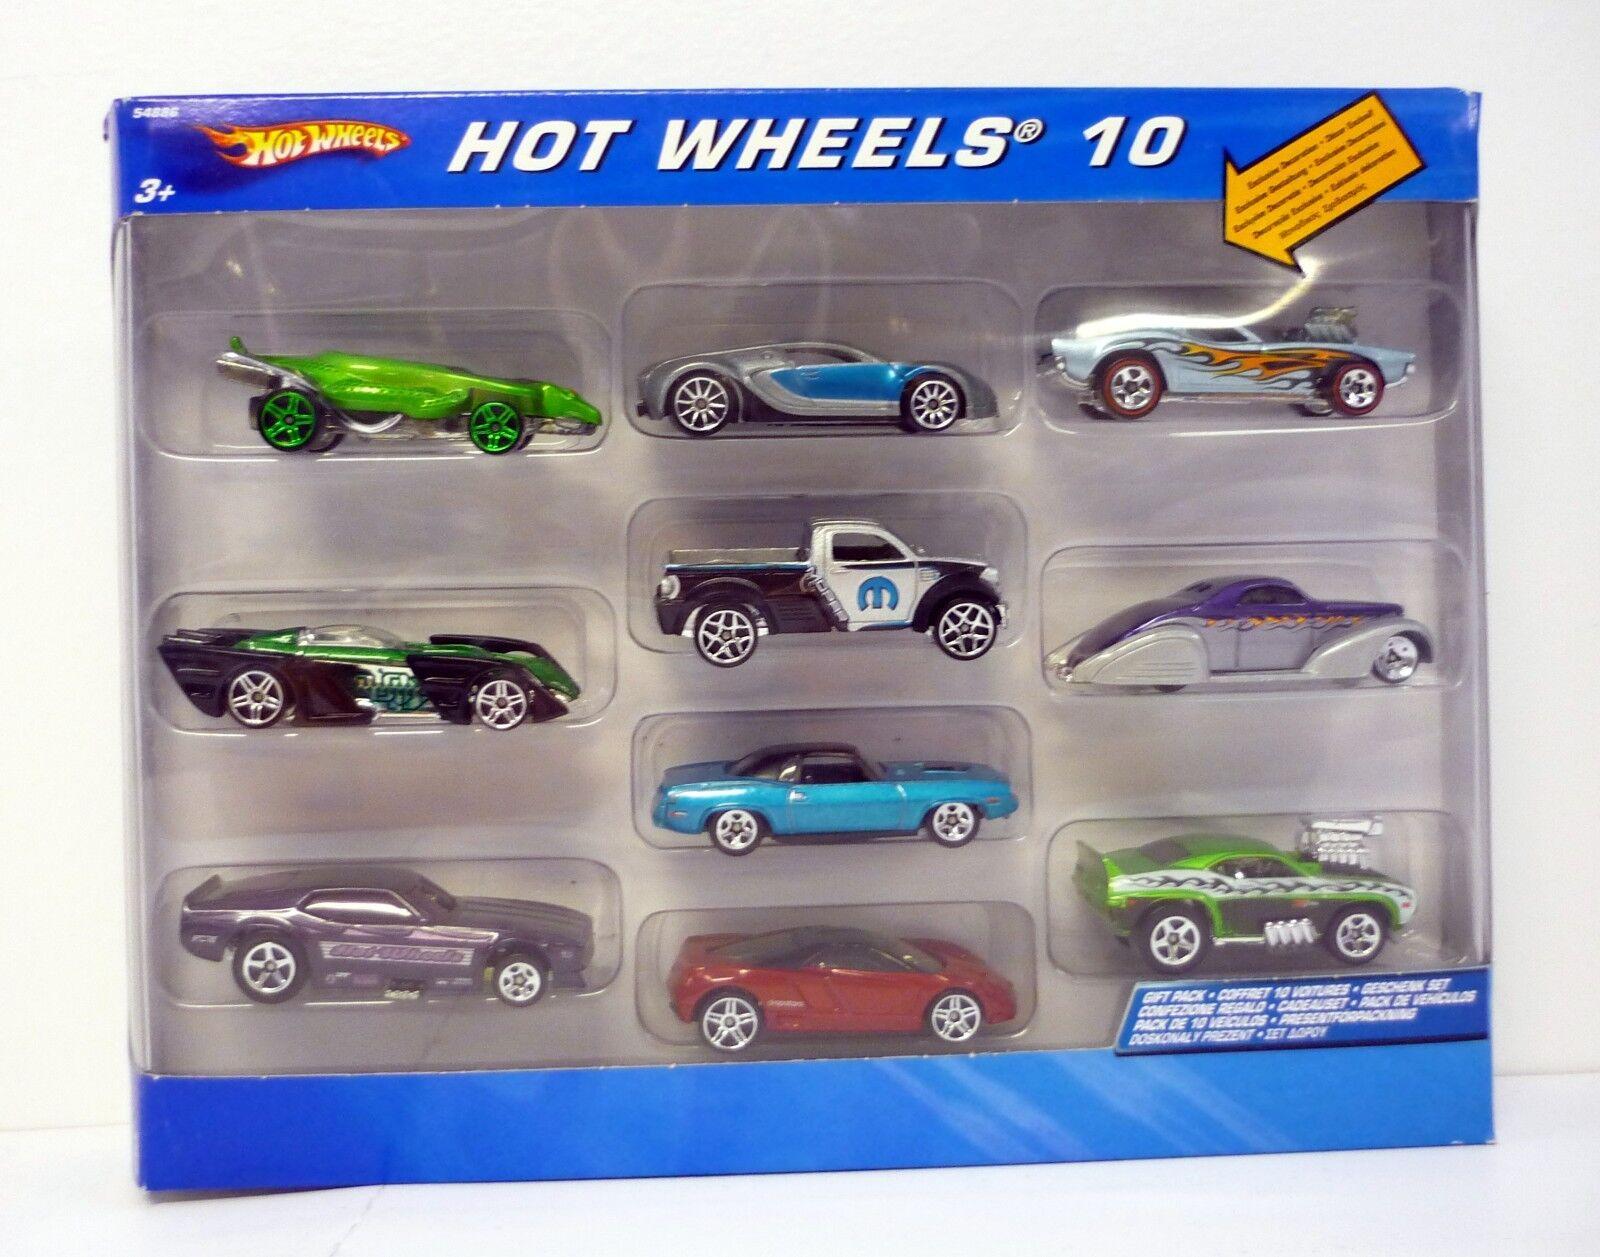 HOT WHEELS 10-CAR GIFT SET Die-Cast Cars Includes Bugatti Veyron MIB 2005